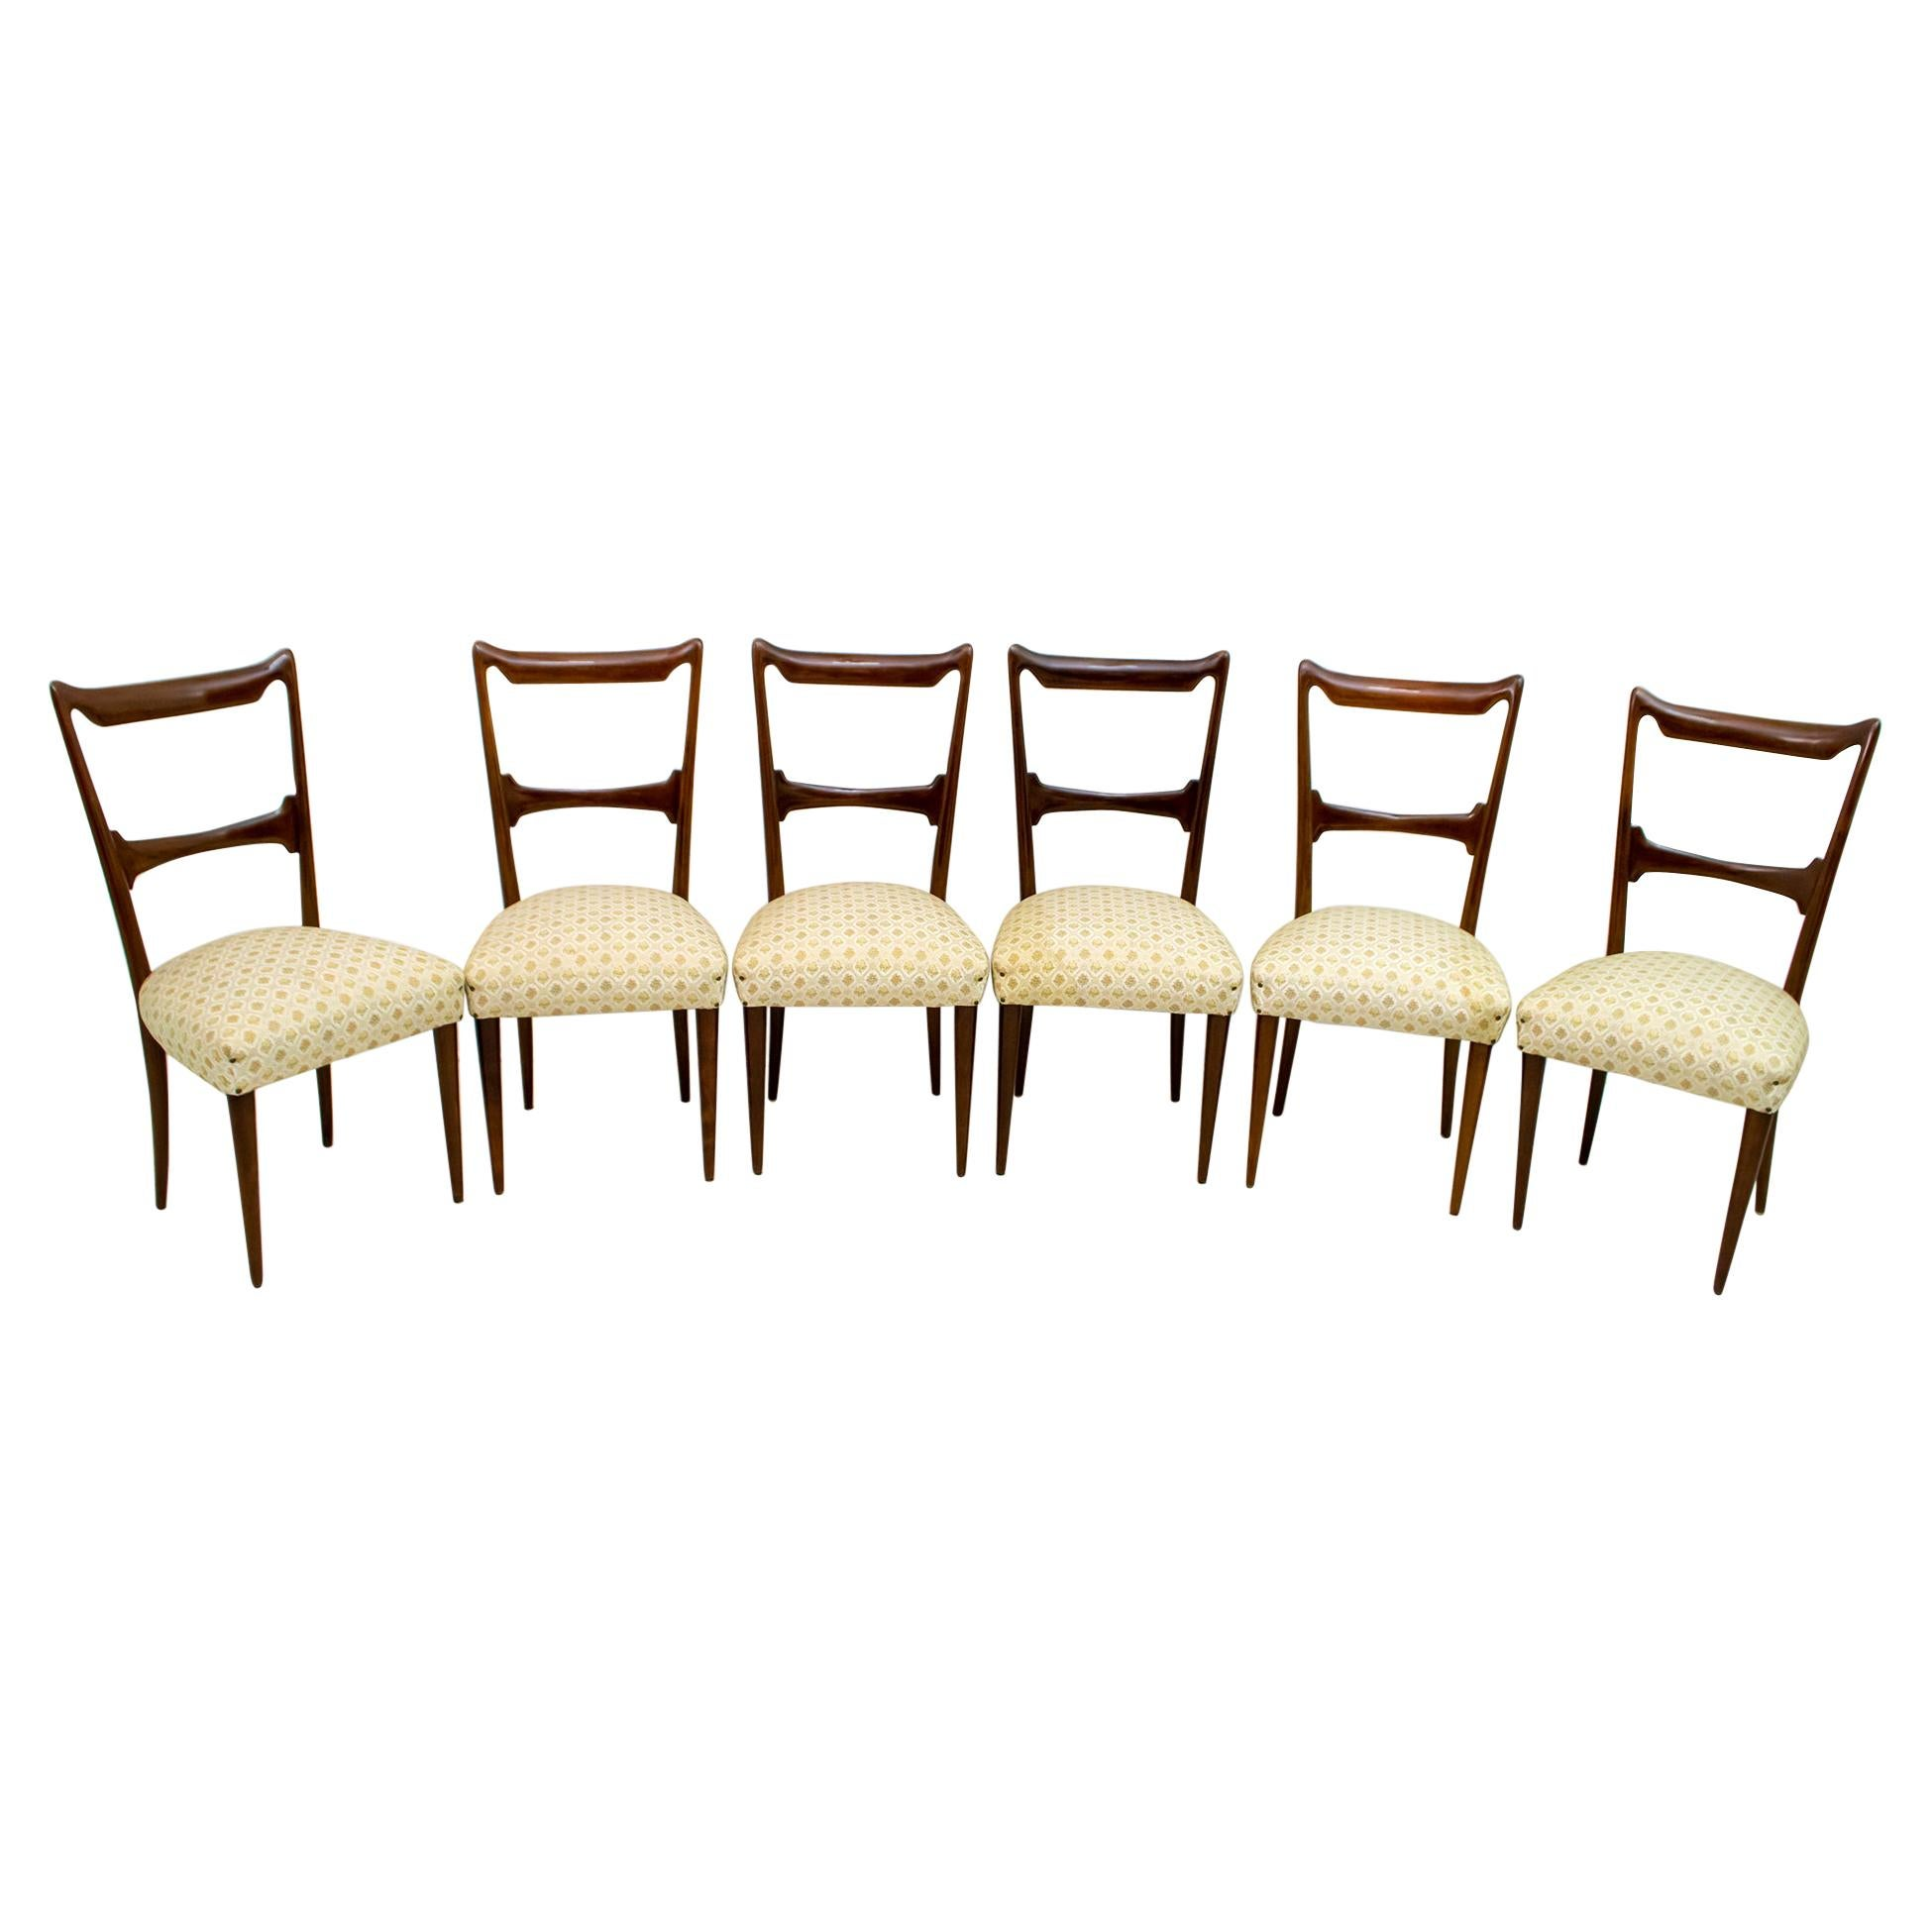 Six Guglielmo Ulrich Mid-Century Modern Italian Walnut Dining Chairs, 1950s